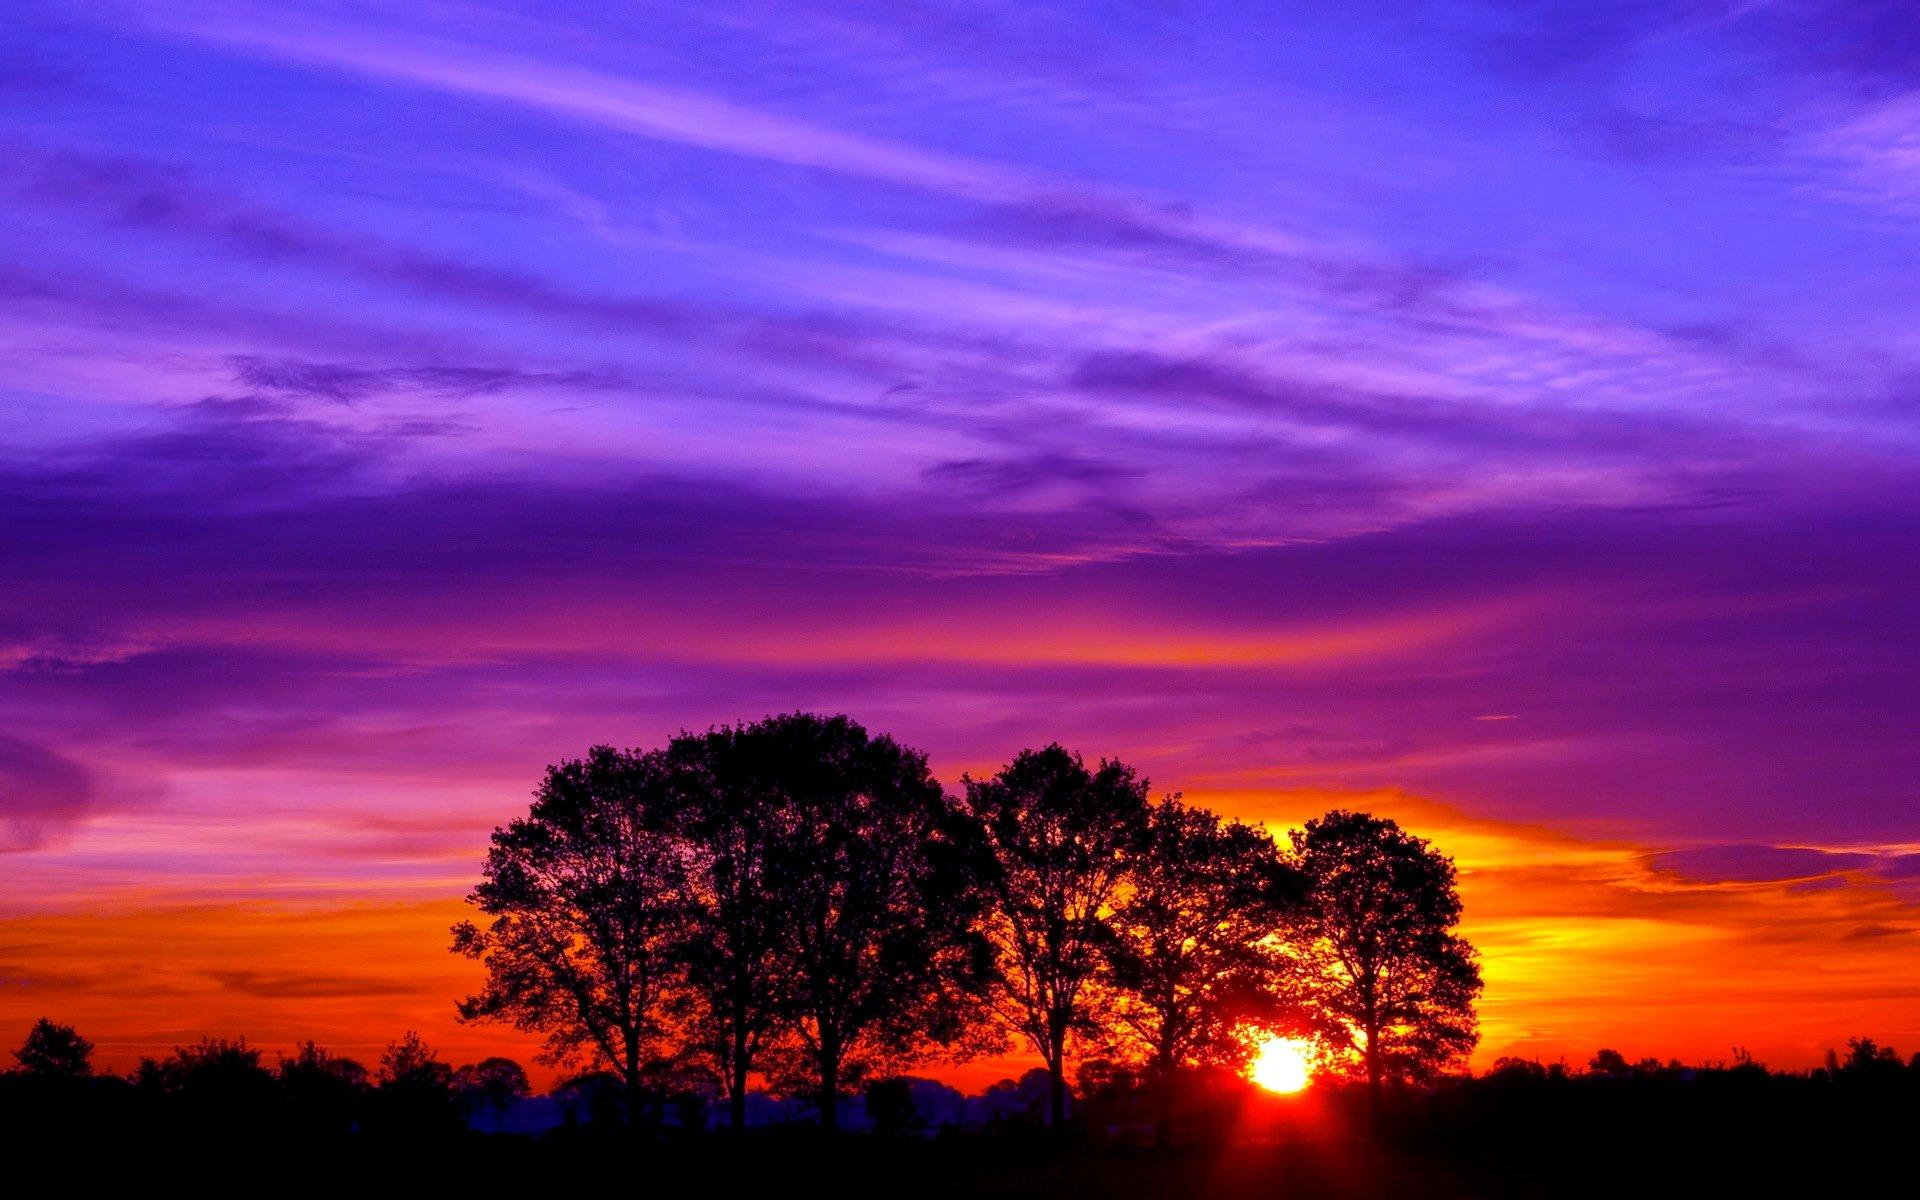 Beautiful Sunset Hd Wallpaper Wallpapersafari